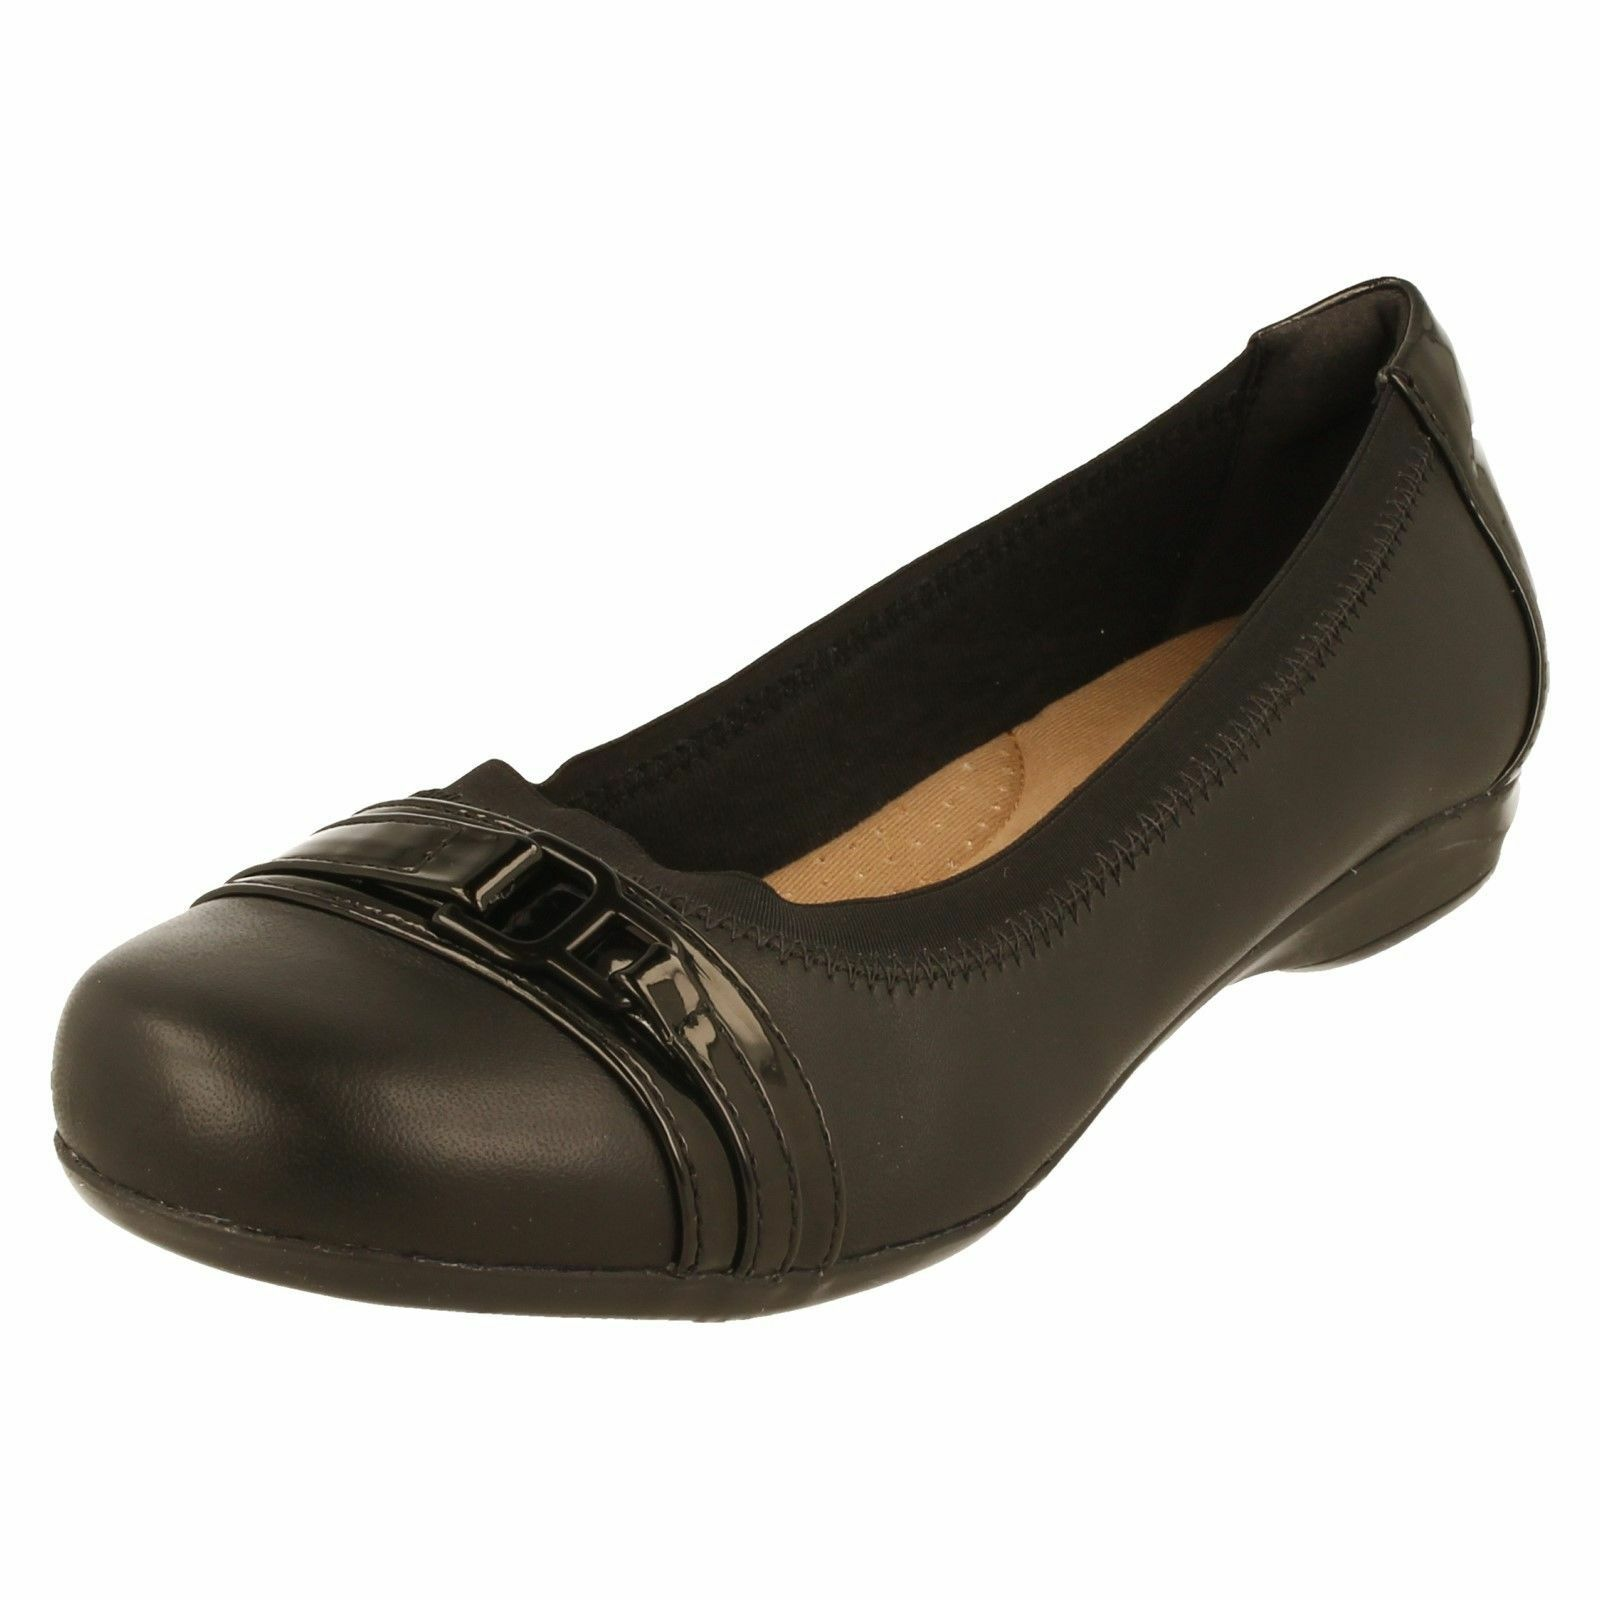 Donna larghezza D slip-on Kinzie CHIARO scarpe slip-on D da Clarks 409a8a